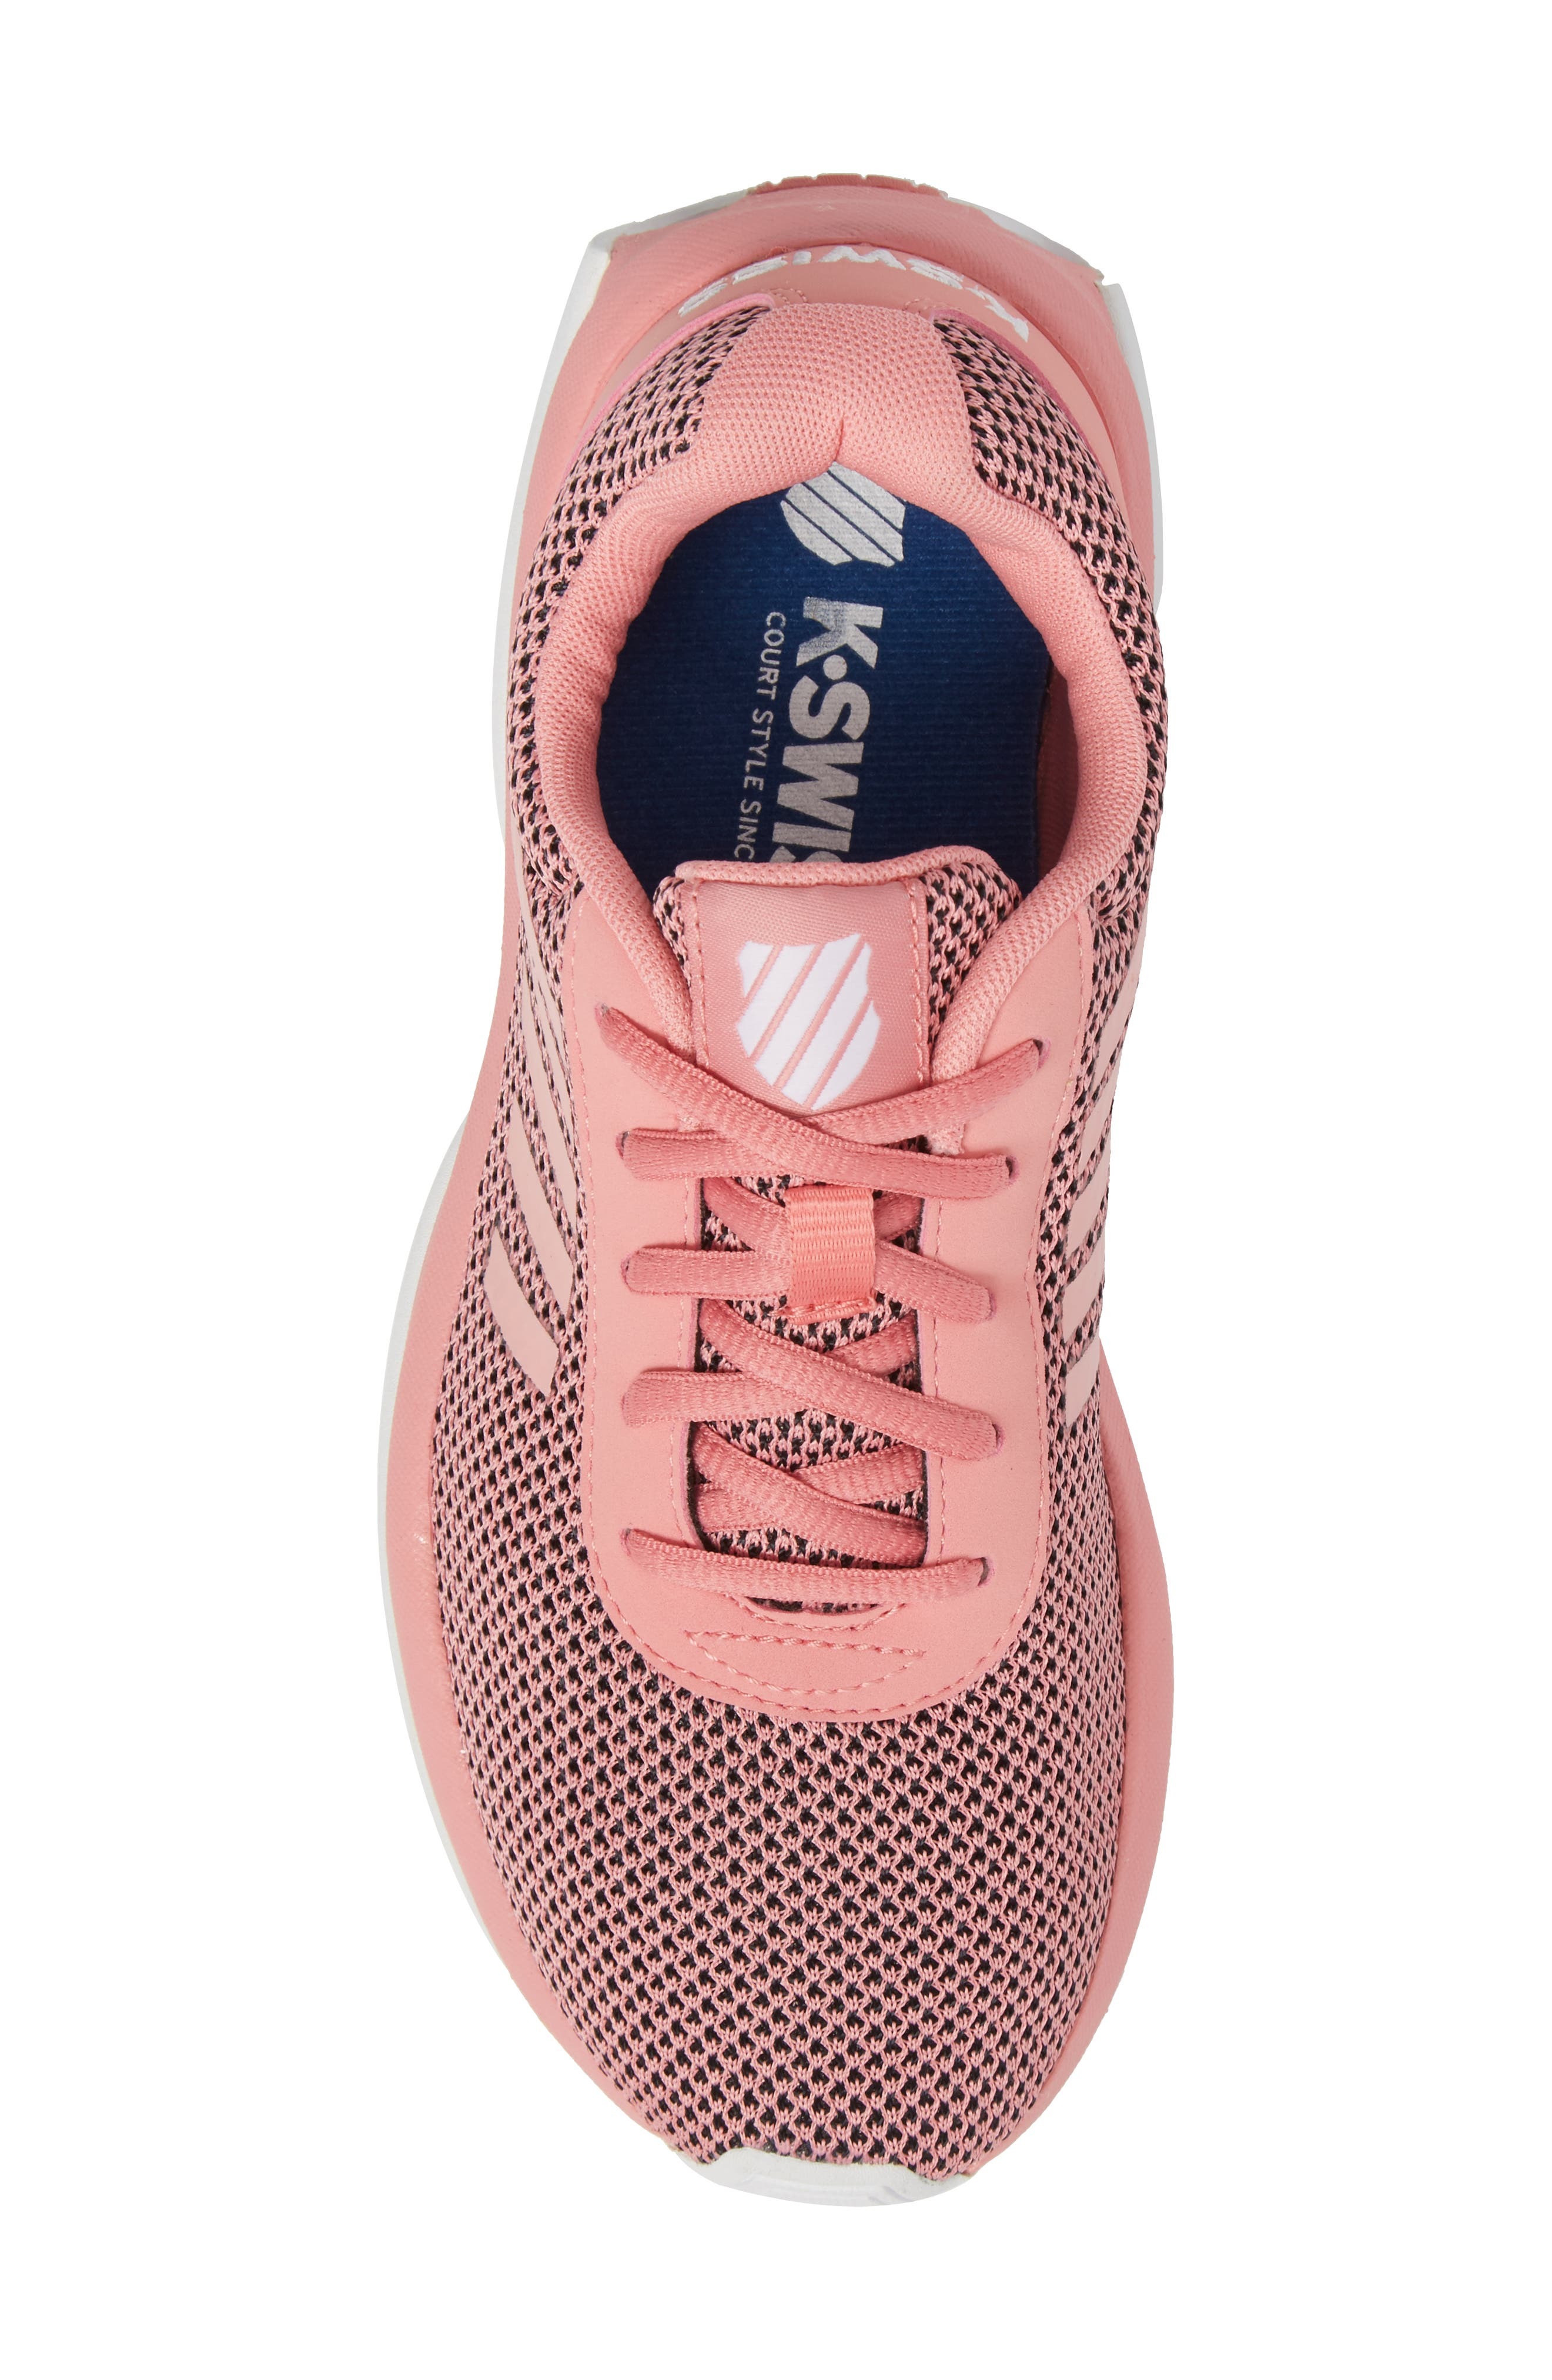 Tubes Infinity Sneaker,                             Alternate thumbnail 5, color,                             650